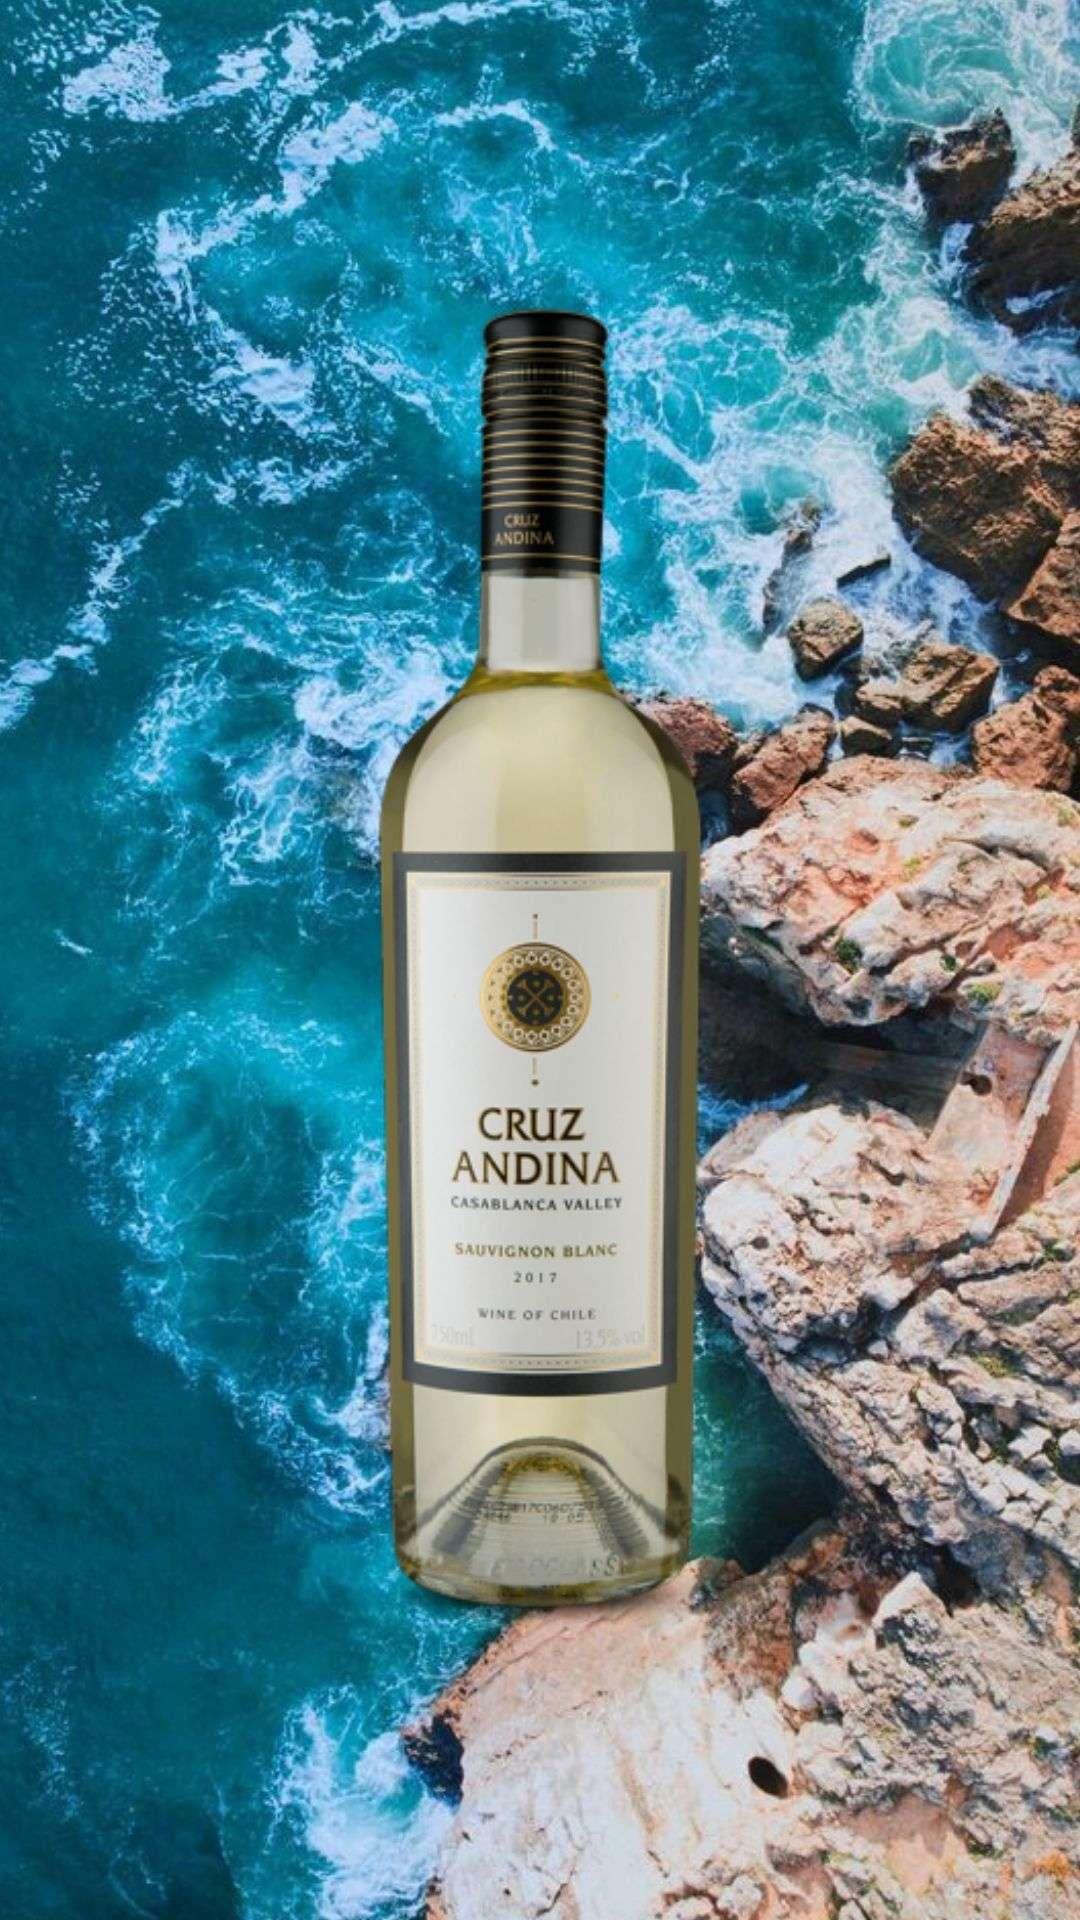 Cruz Andina Reserva Sauvignon Blanc